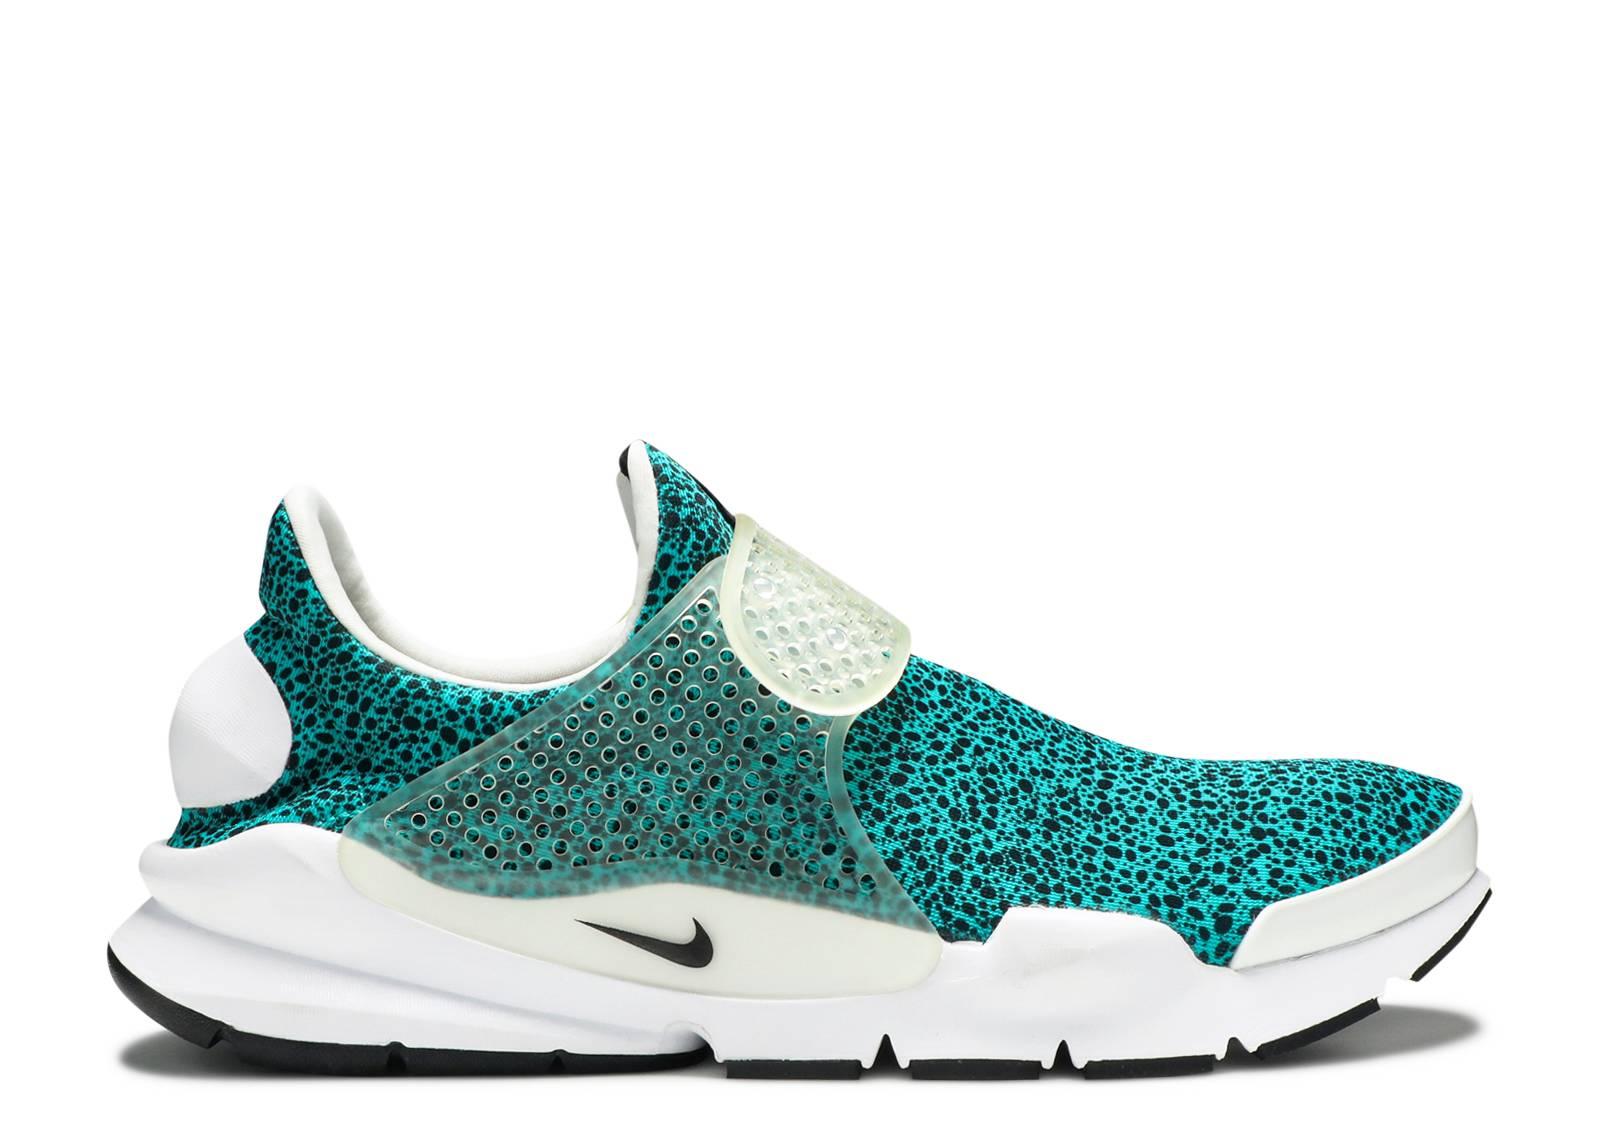 dd10c96d610 Nike Sock Dart Qs